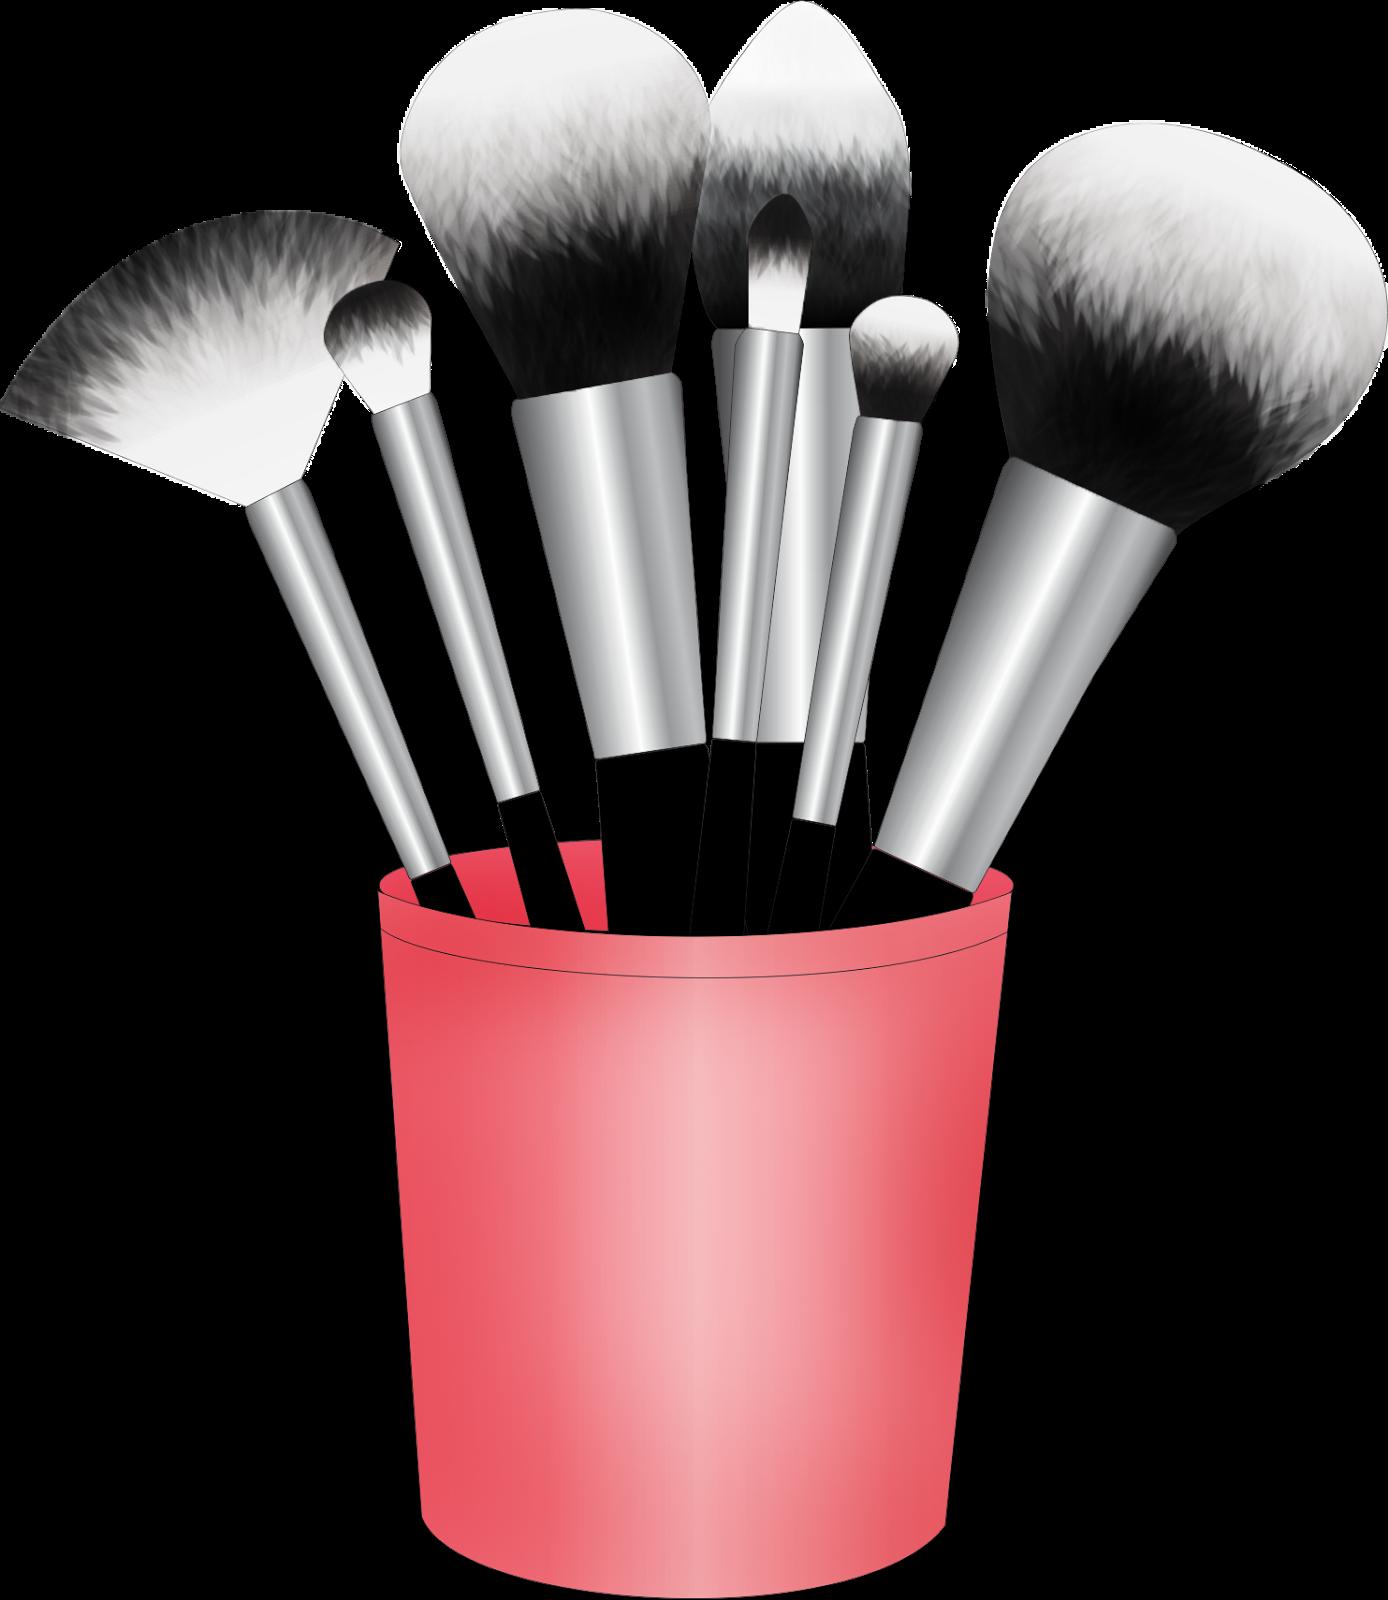 Eu PlusPng.com  - PNG Maquiagem